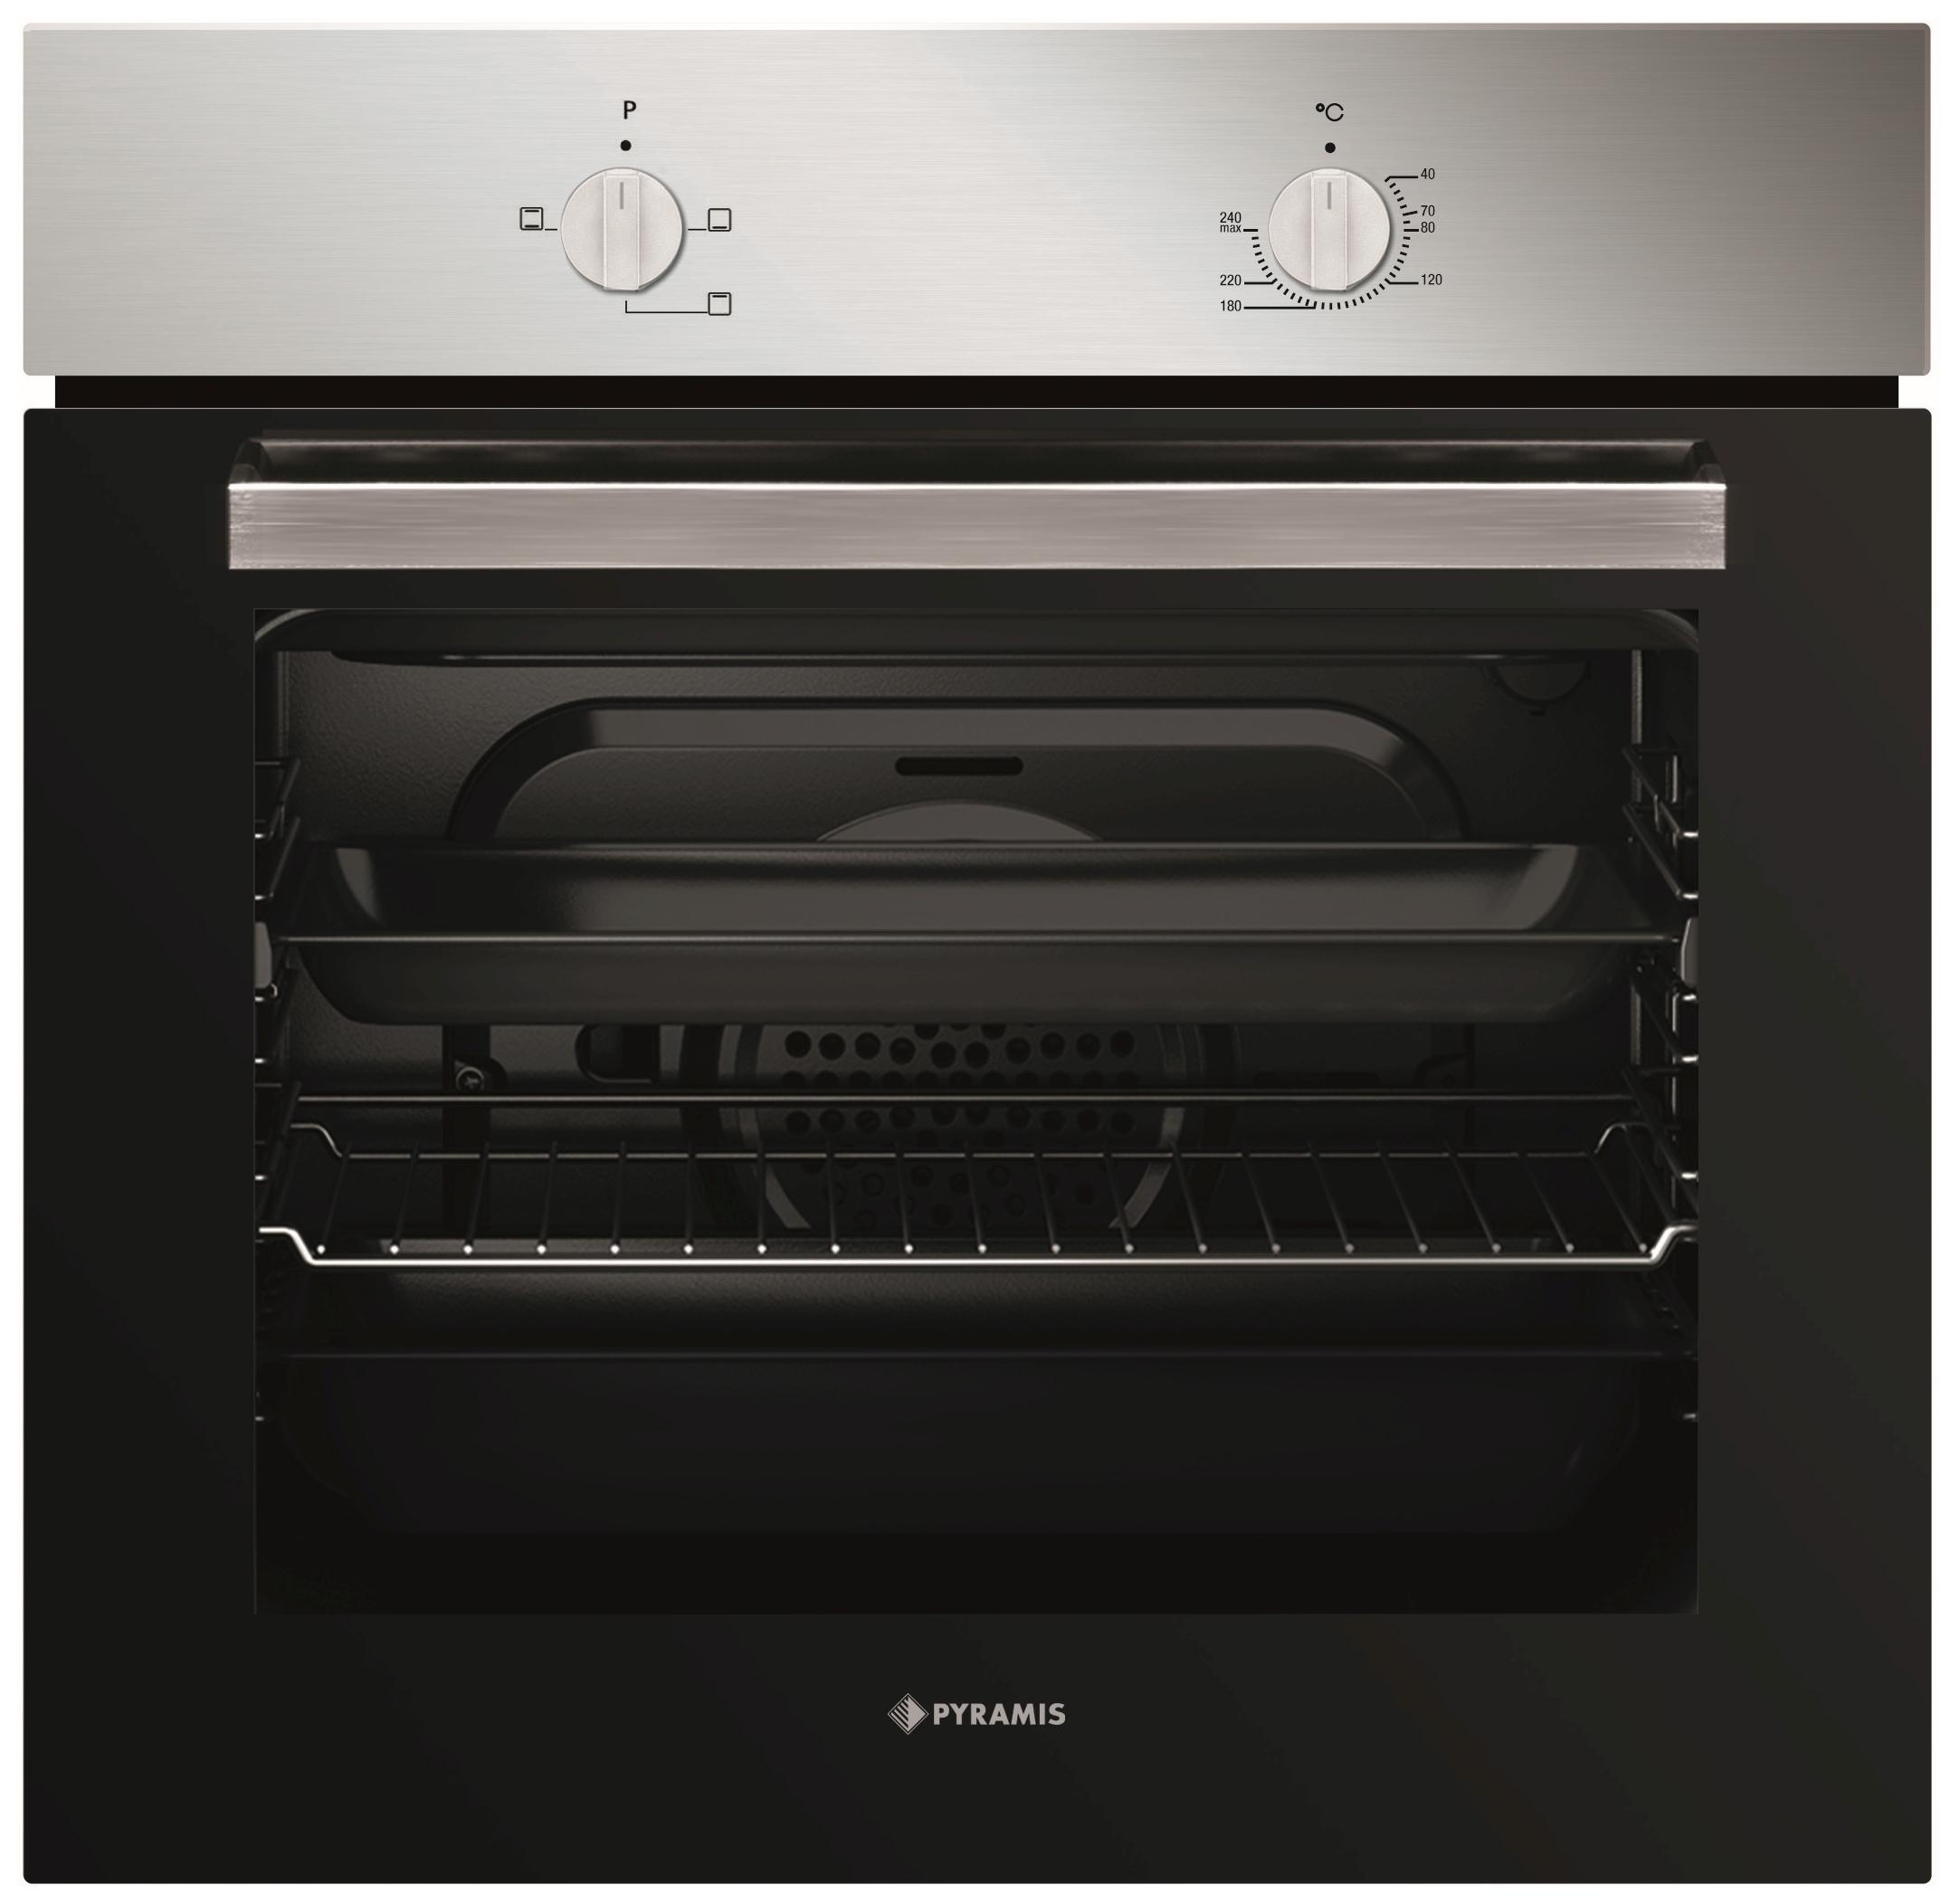 pyramis backofen 60in 1200 inox backofen 034003501. Black Bedroom Furniture Sets. Home Design Ideas